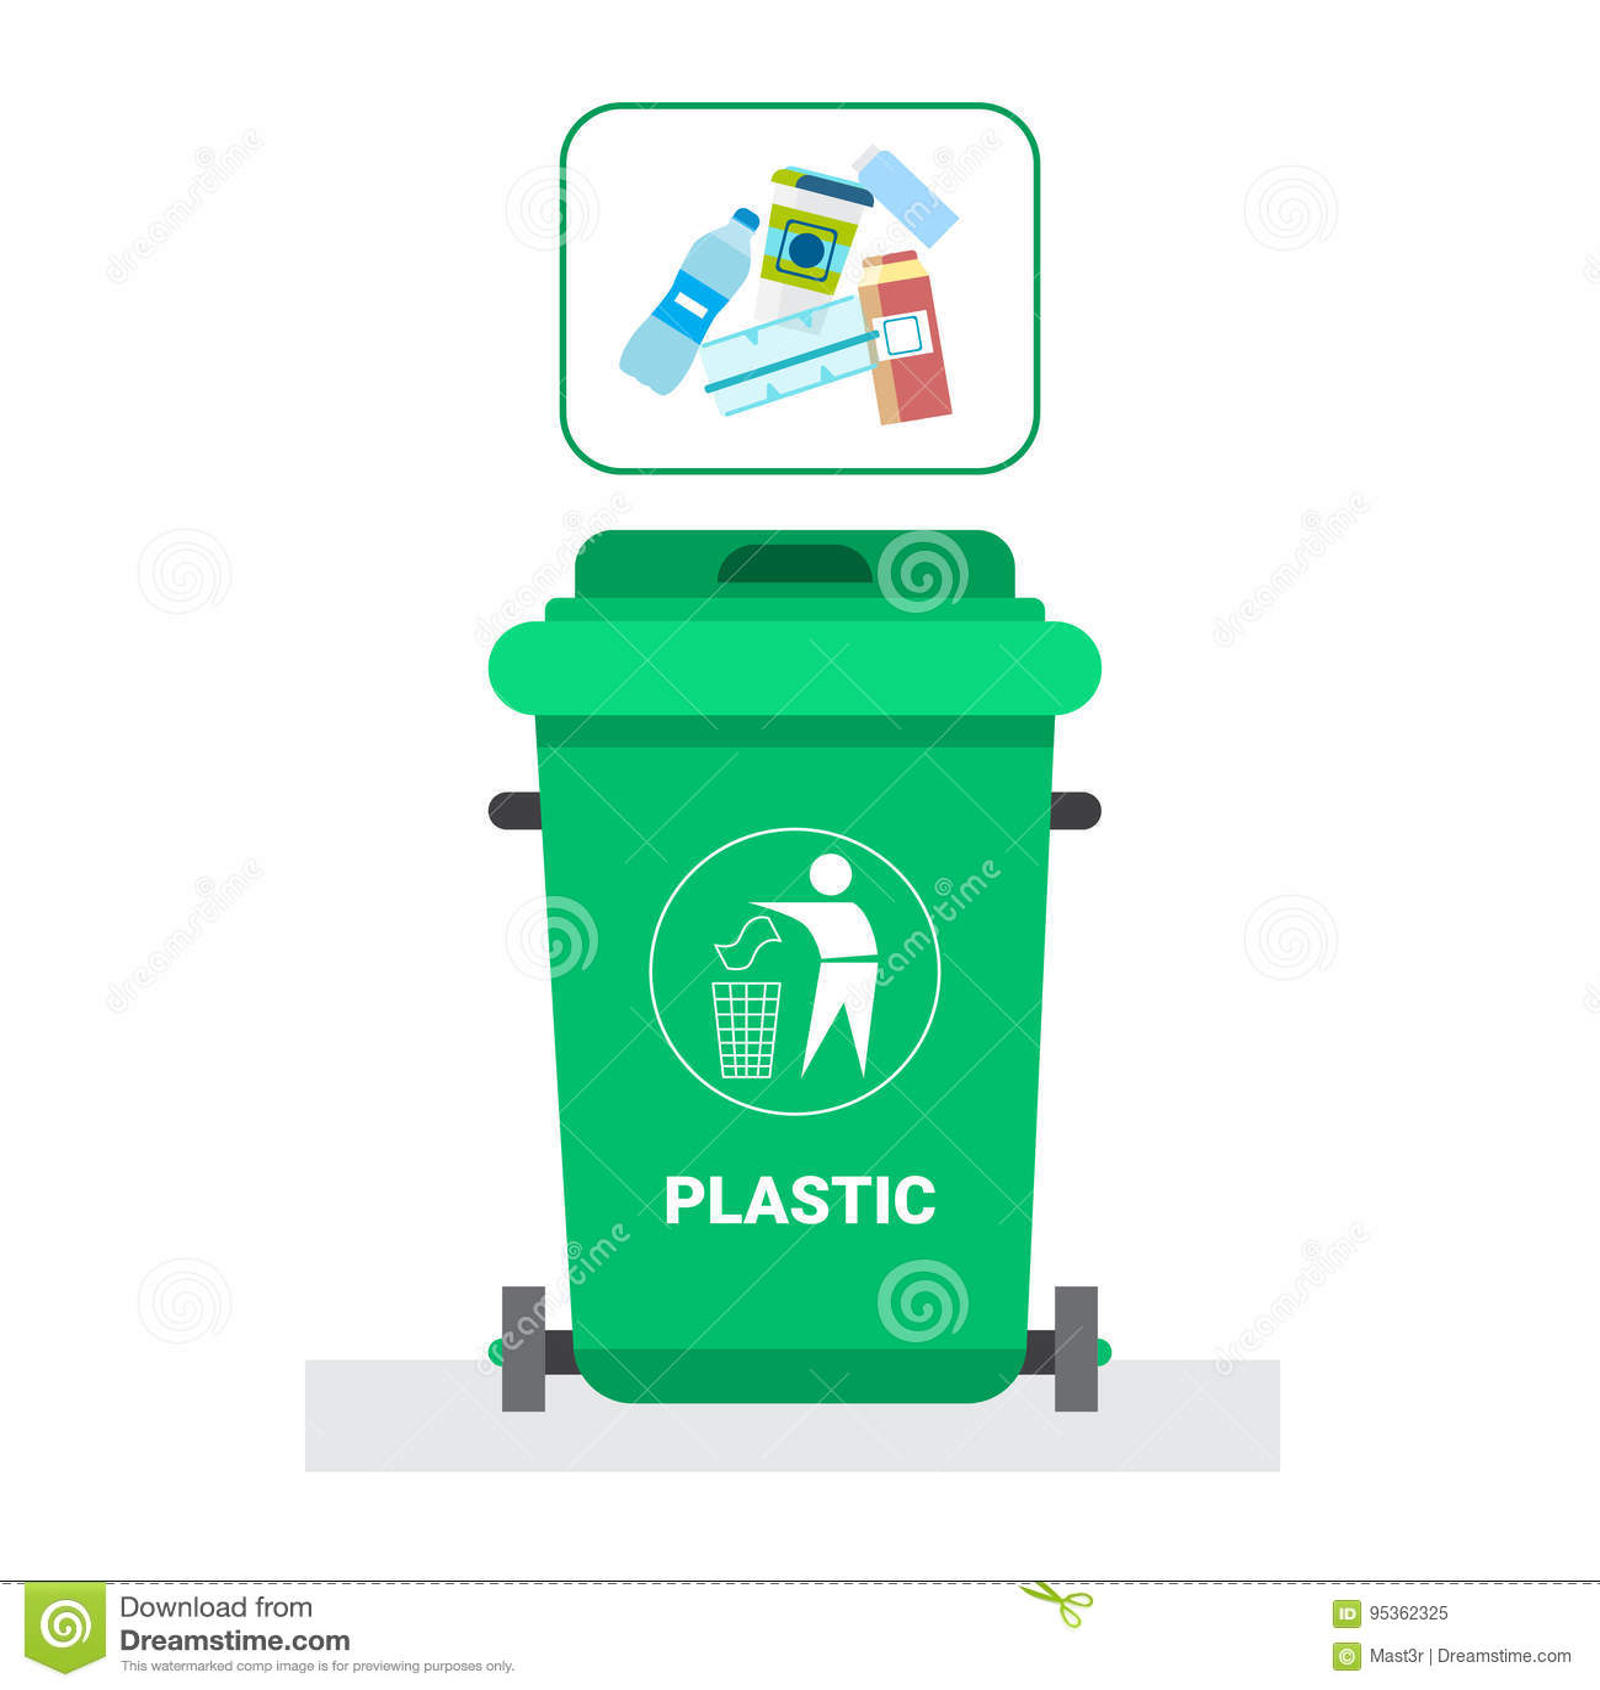 plastic cartoons  illustrations  u0026 vector stock images